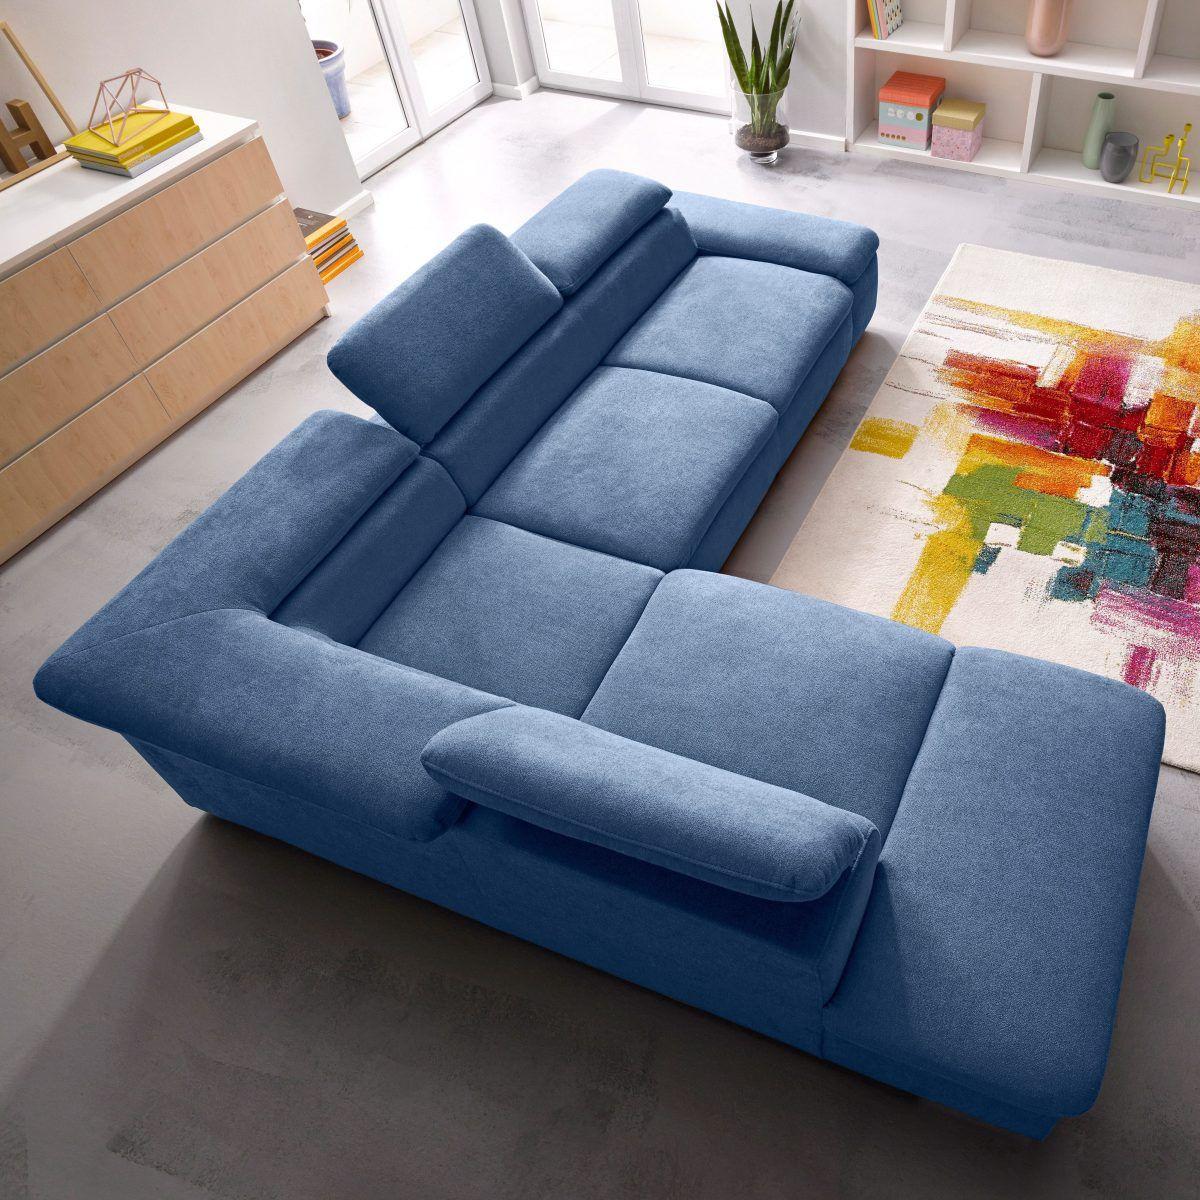 sit&more Ecksofa blau, Ottomane links, FSC®-zertifiziert Jetzt ...